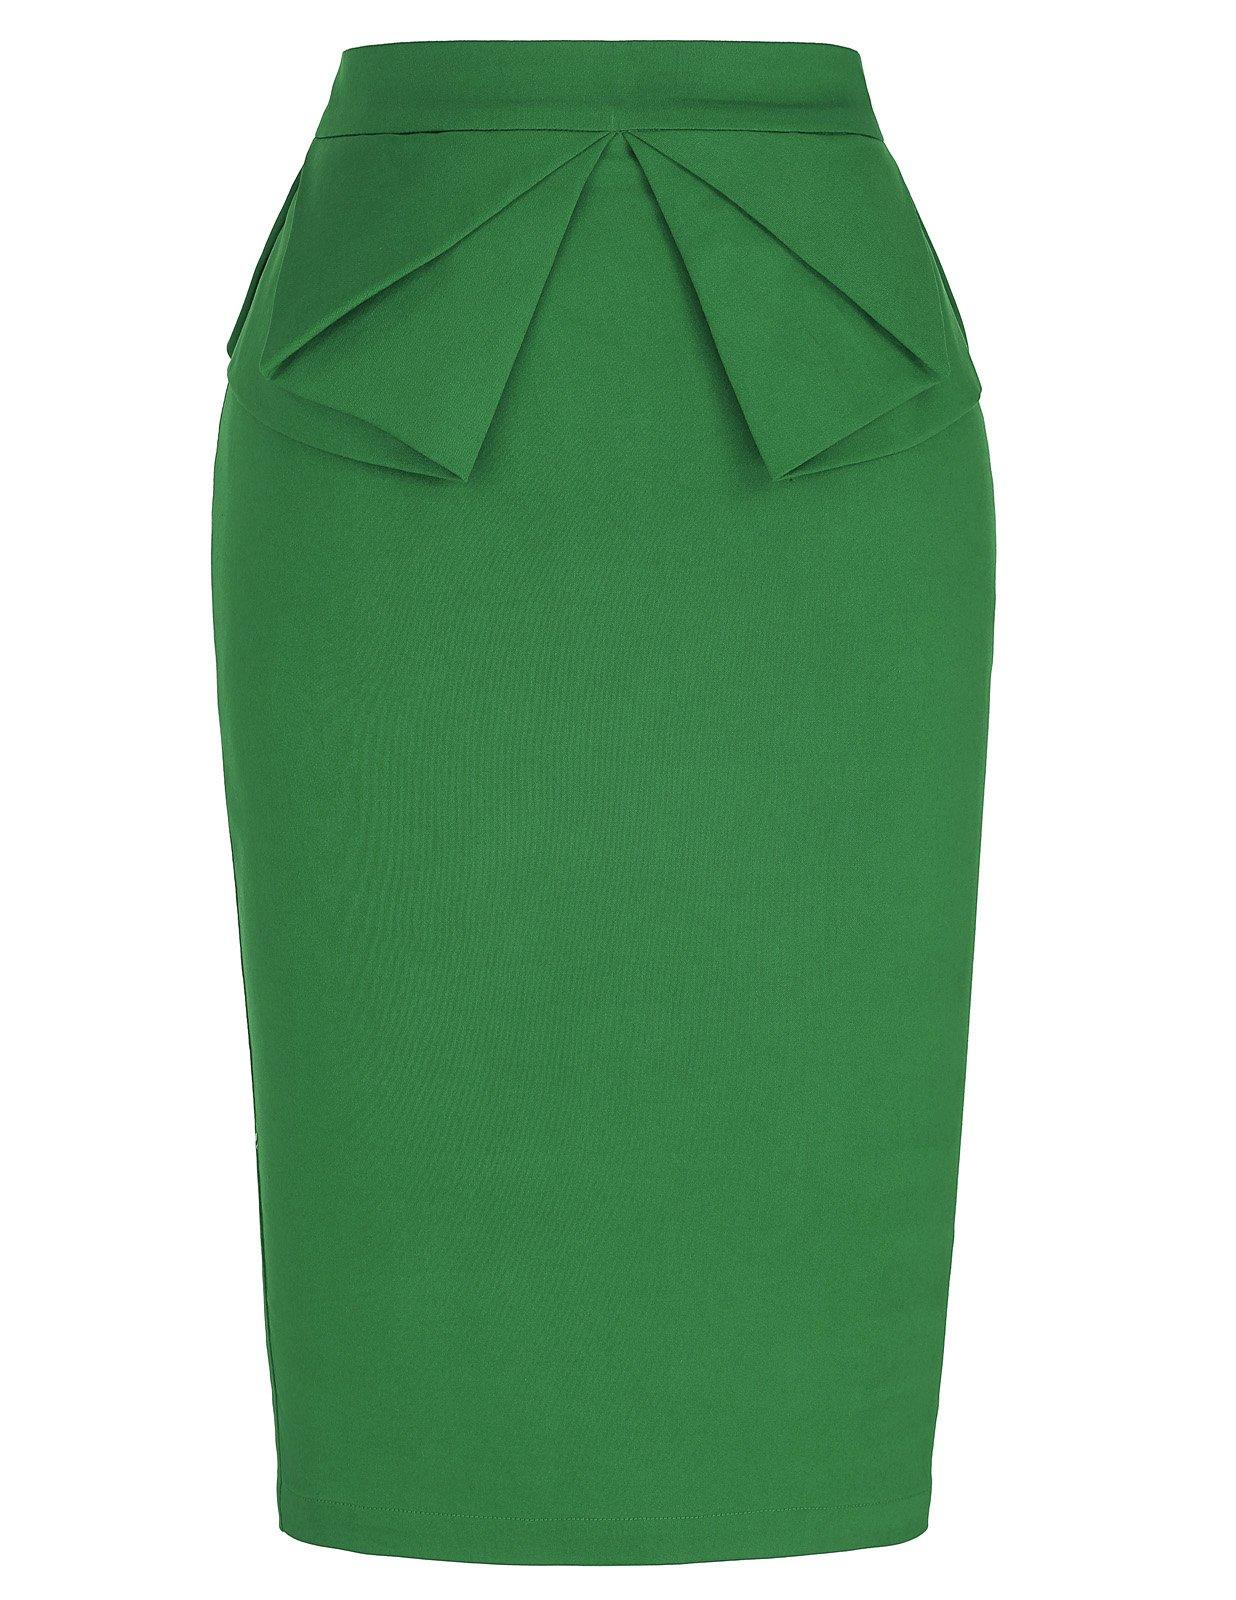 PrettyWorld Vintage Dress Grace Karin Slim Vintage Pencil Skirts For Women, Cl454-green, X-Large